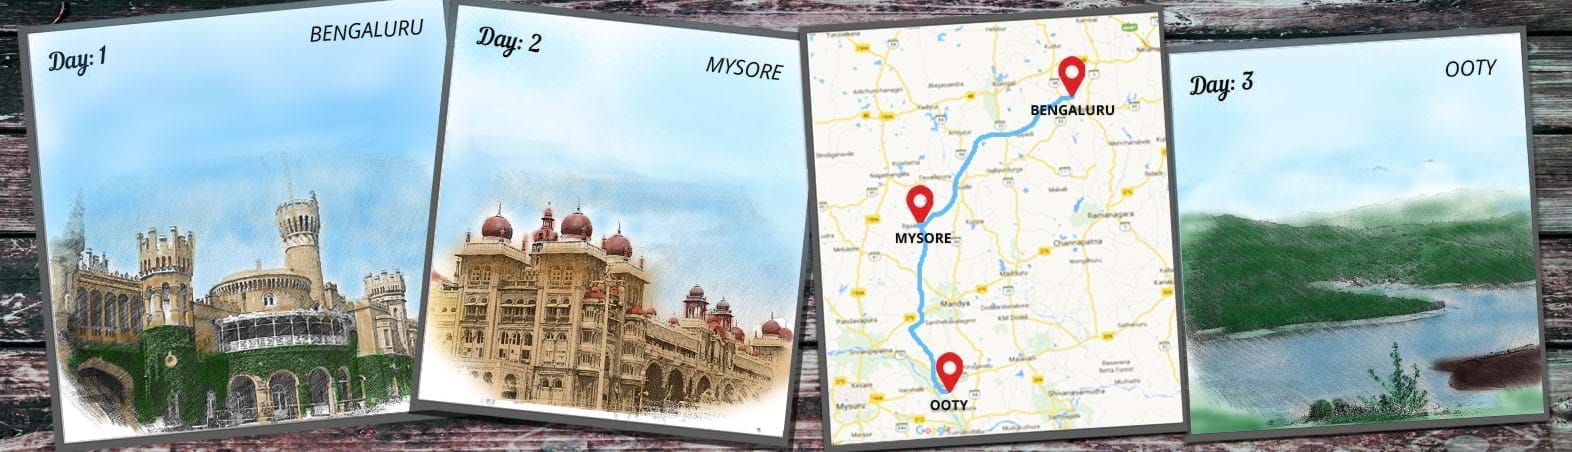 Bengaluru-Mysore-Ooty Circuit